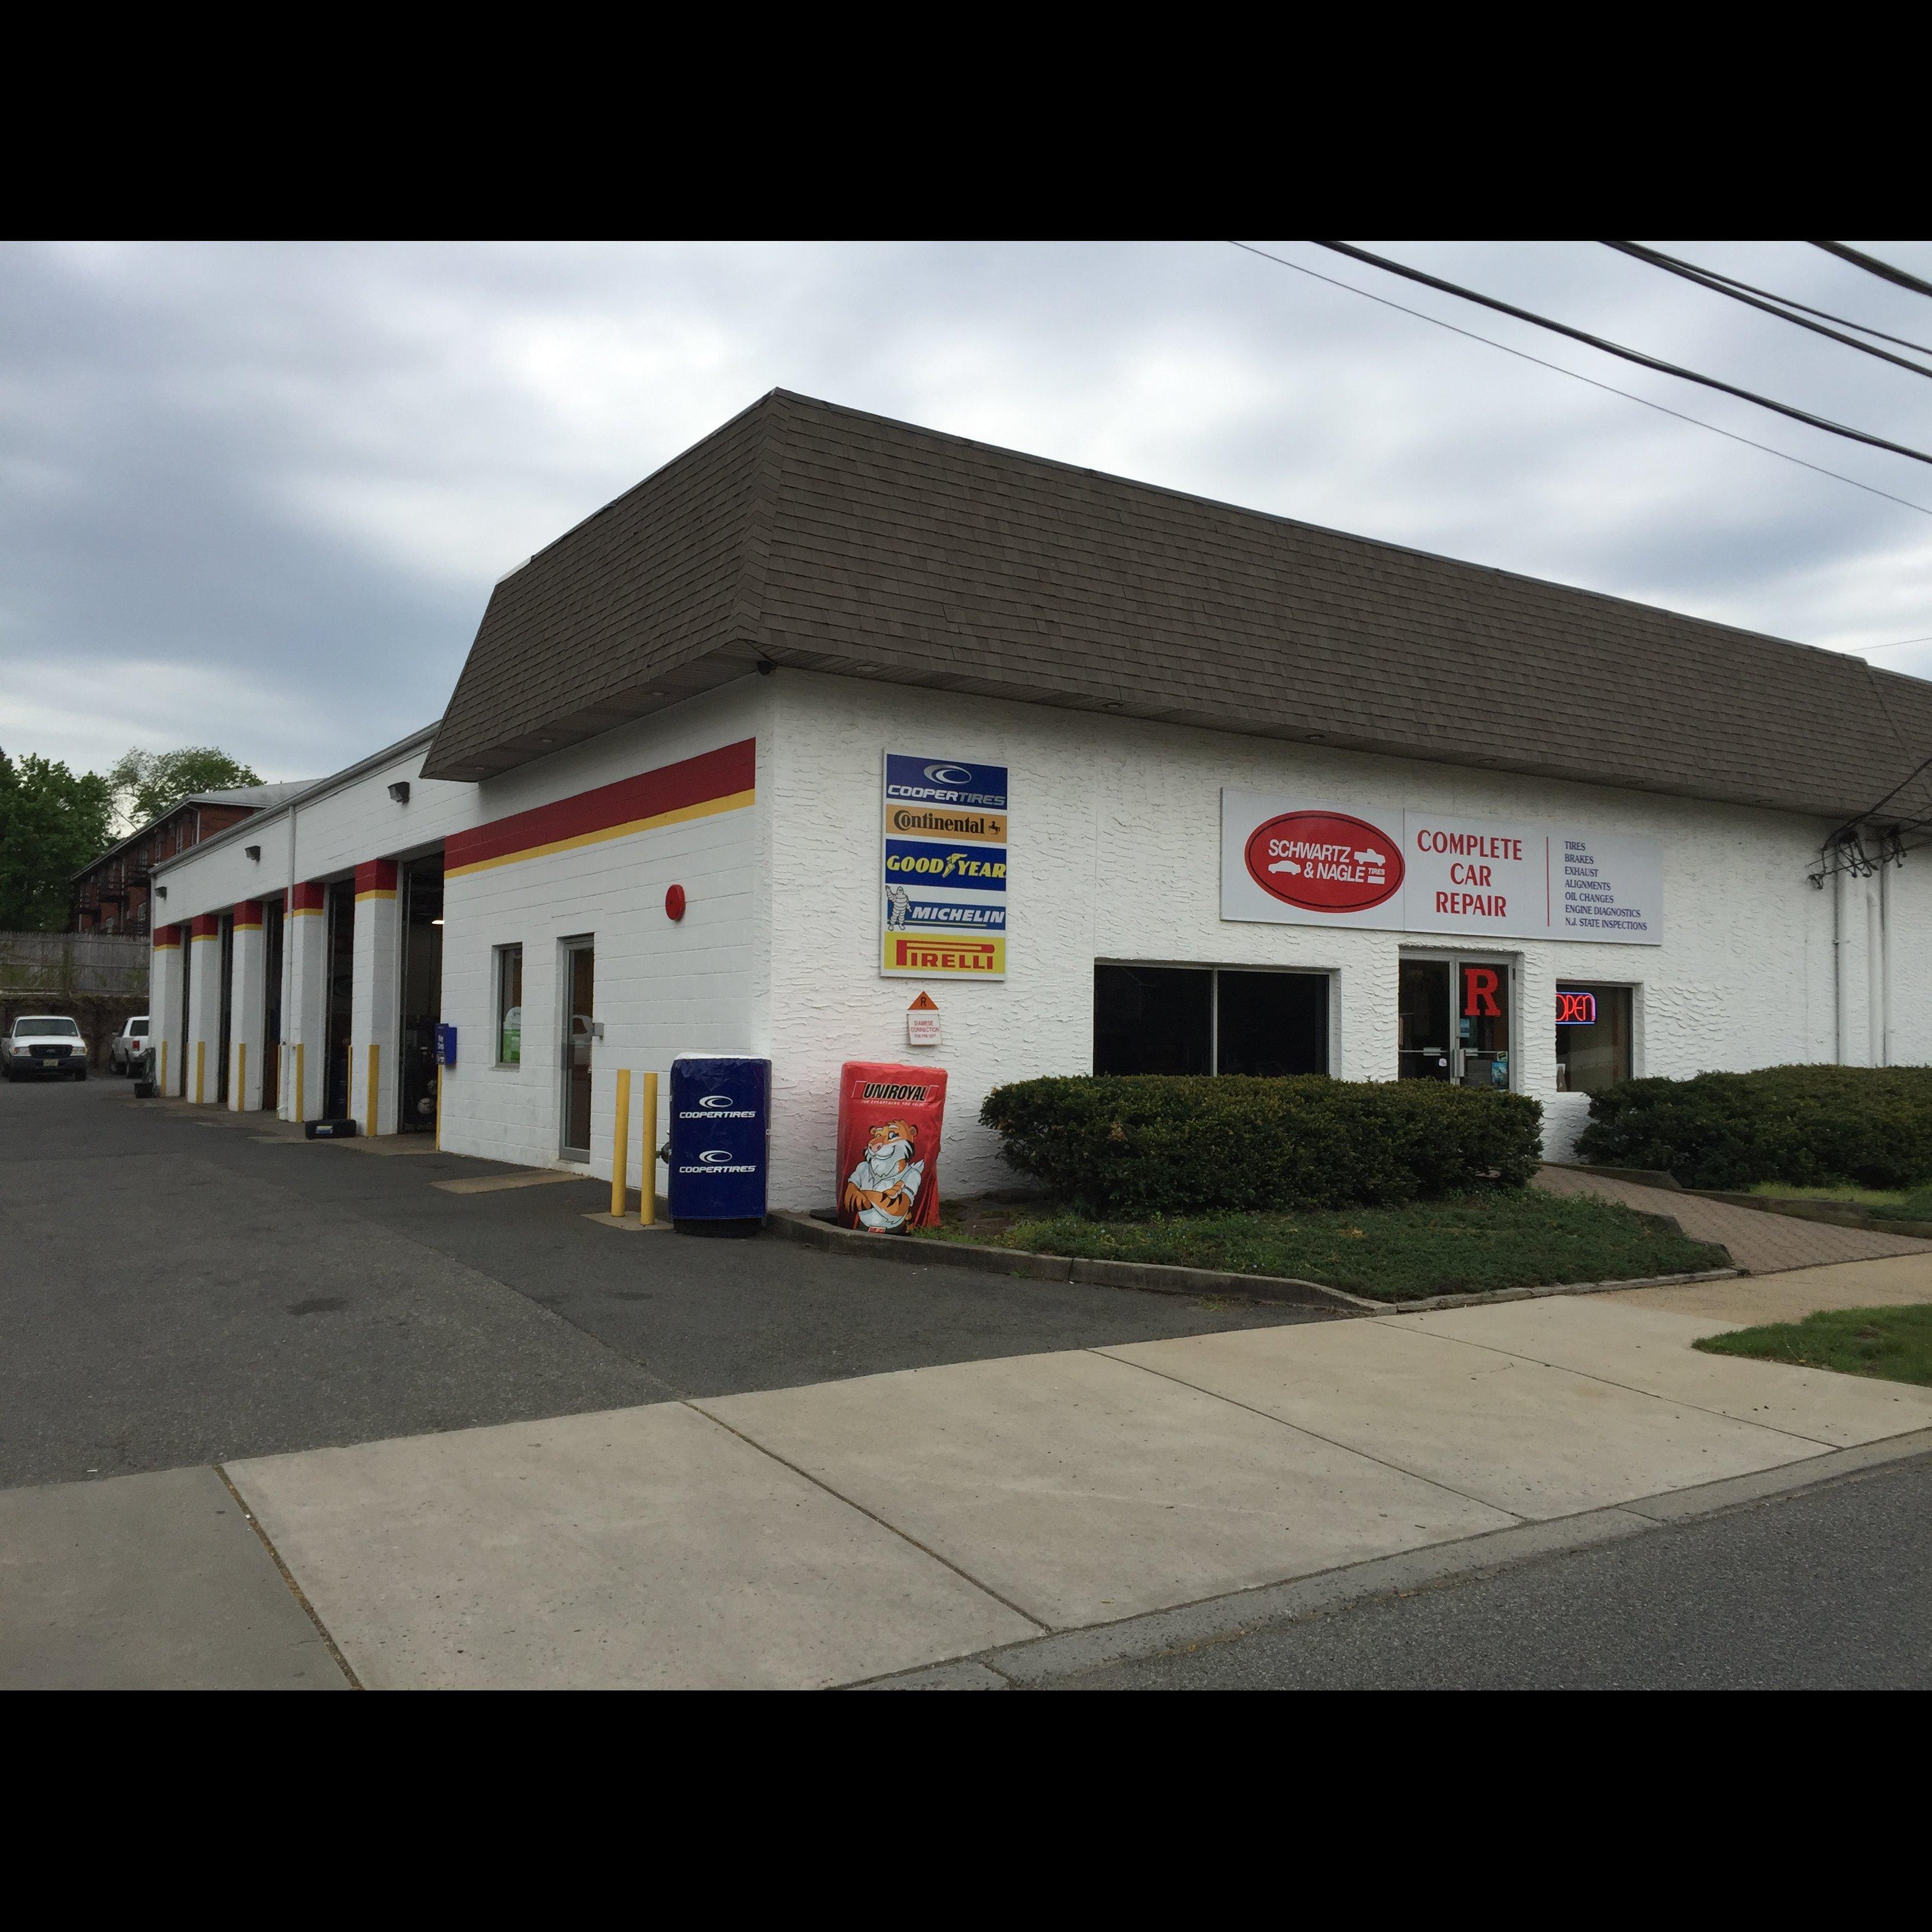 Schwartz & Nagle Tires Inc, Complete Auto Repair